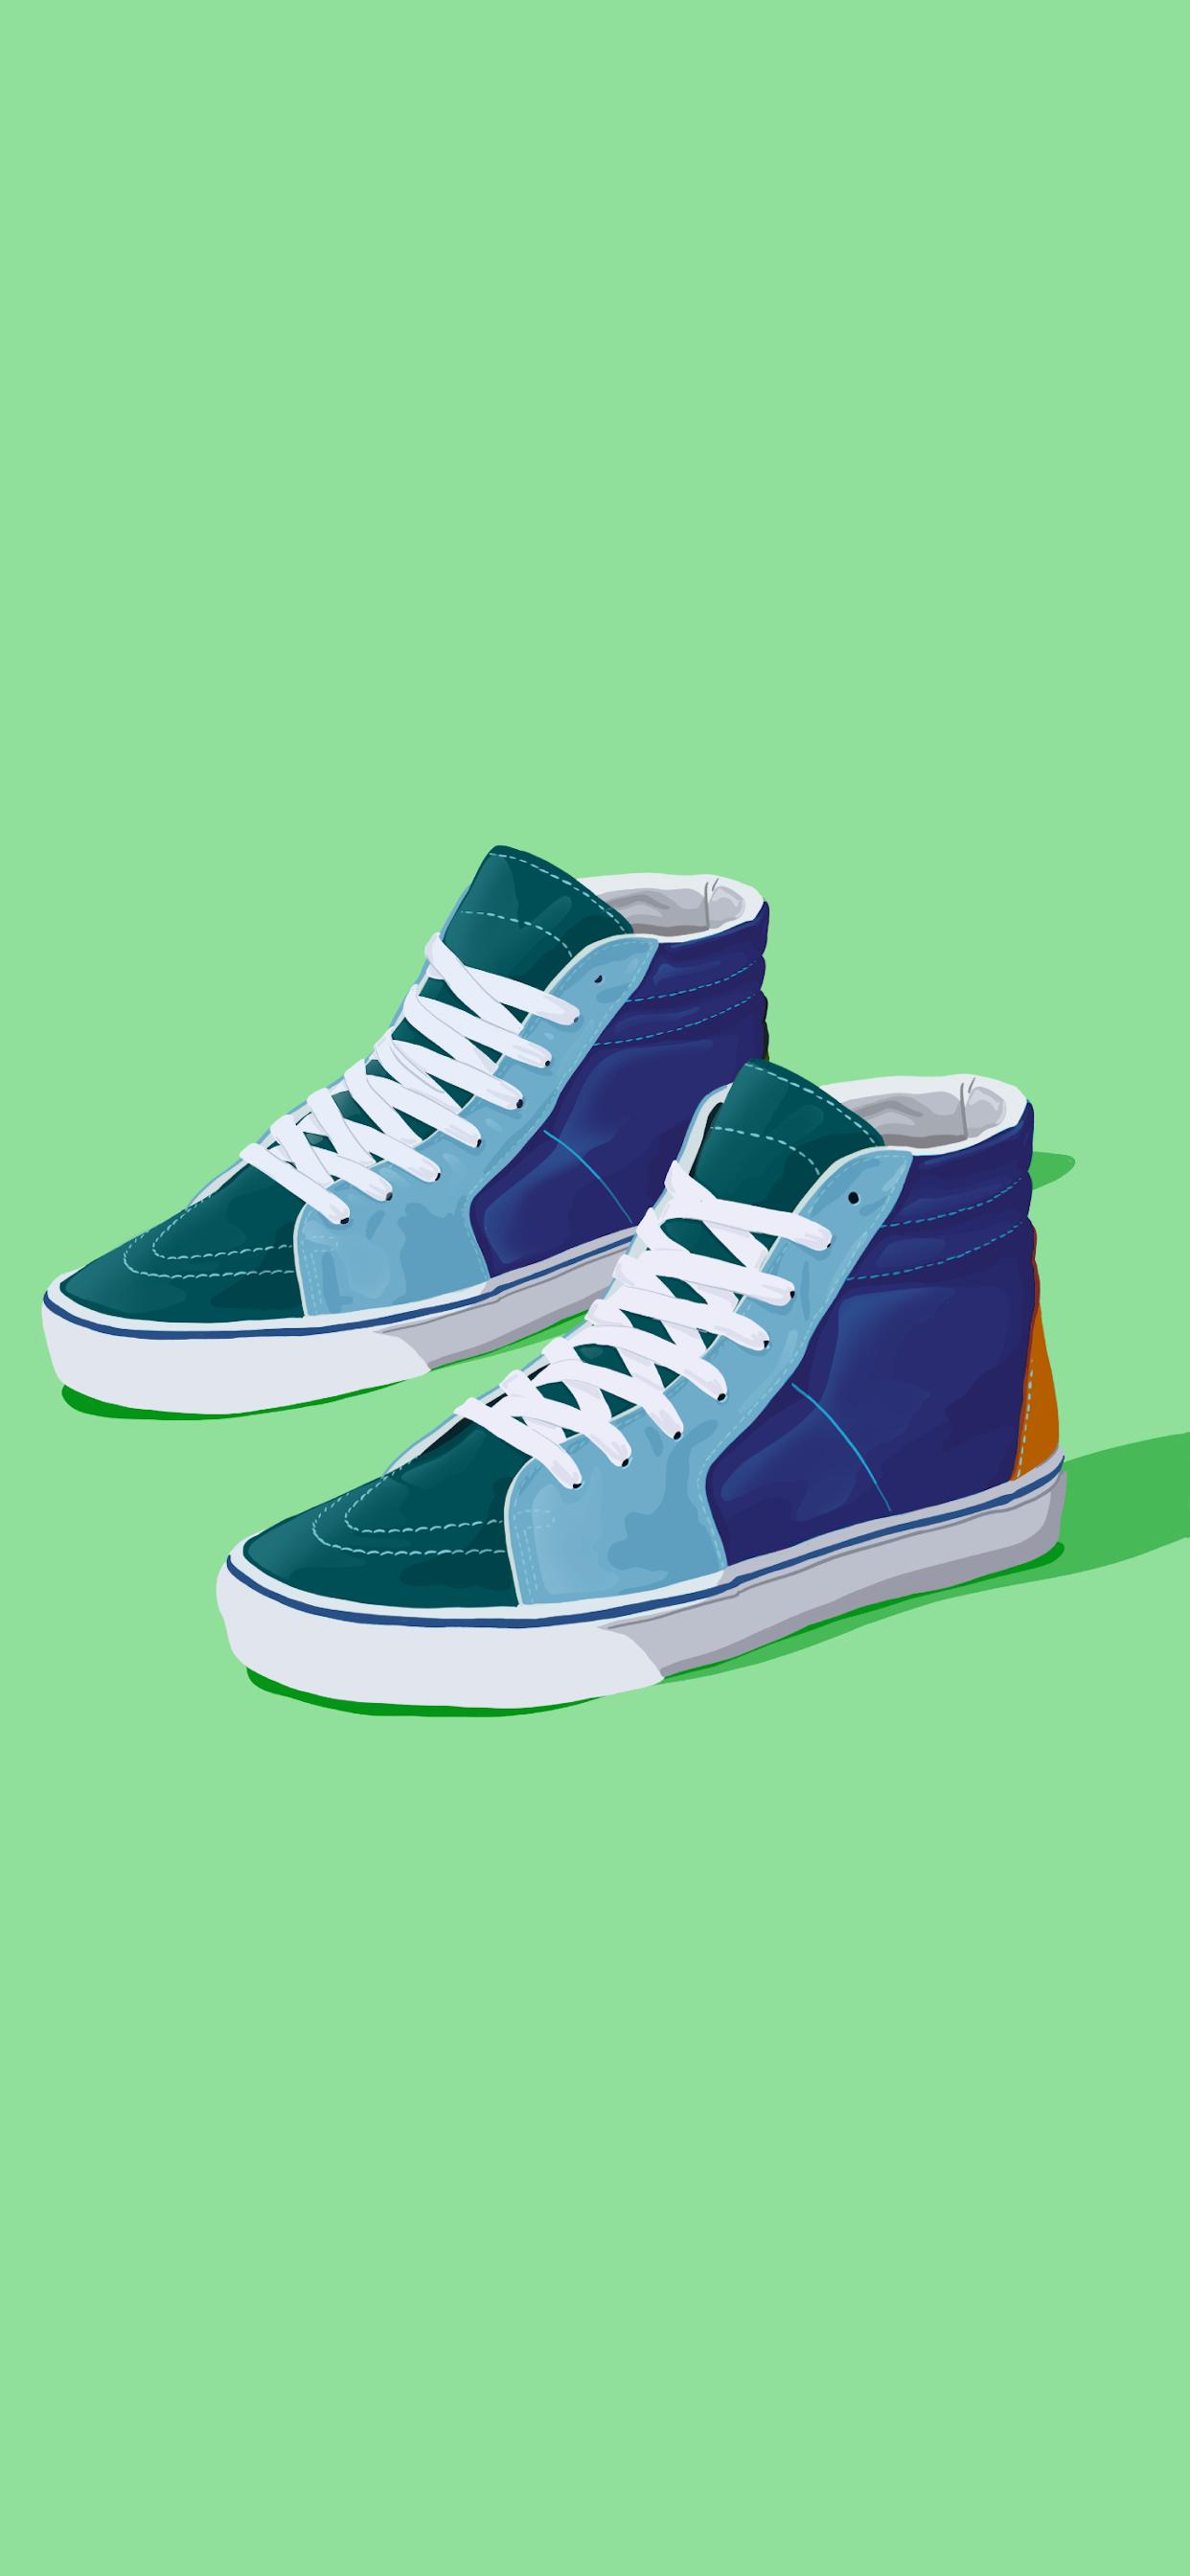 iPhone wallpapers illustration sneakers Fonds d'écran iPhone du 02/10/2019